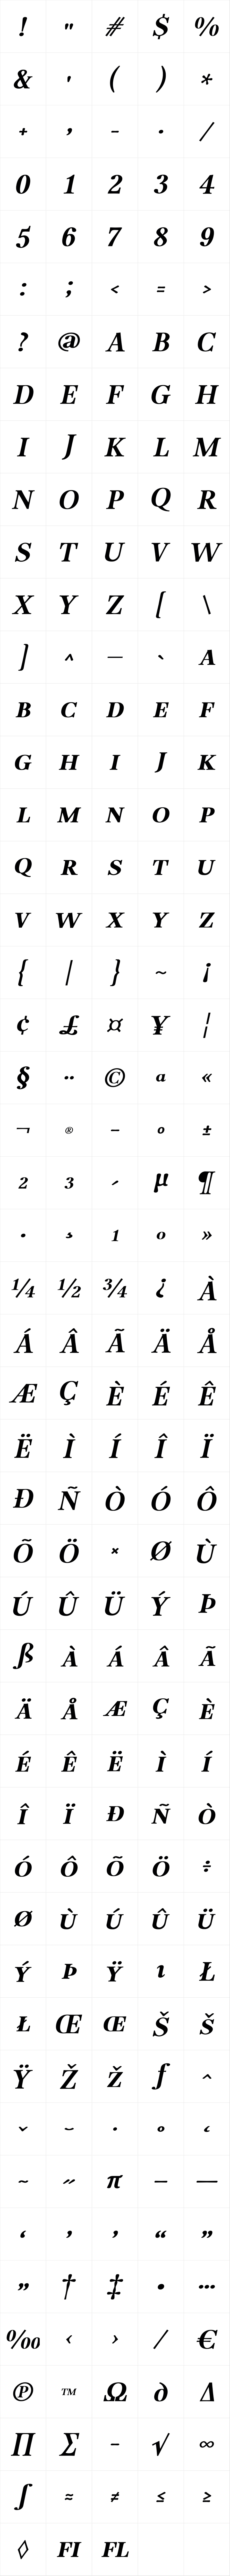 P22 Foxtrot SC Bold Italic